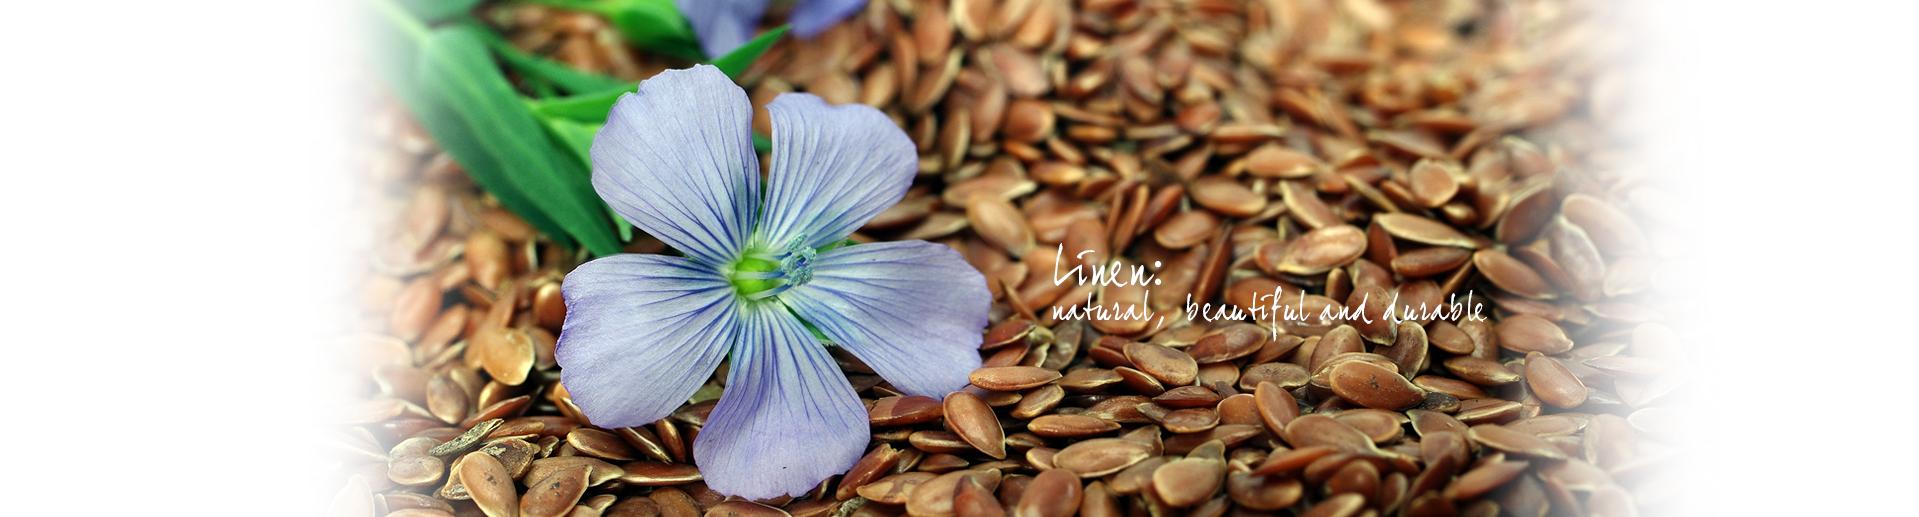 Slide Telene Nencioni   Natural Beautiful and Durable